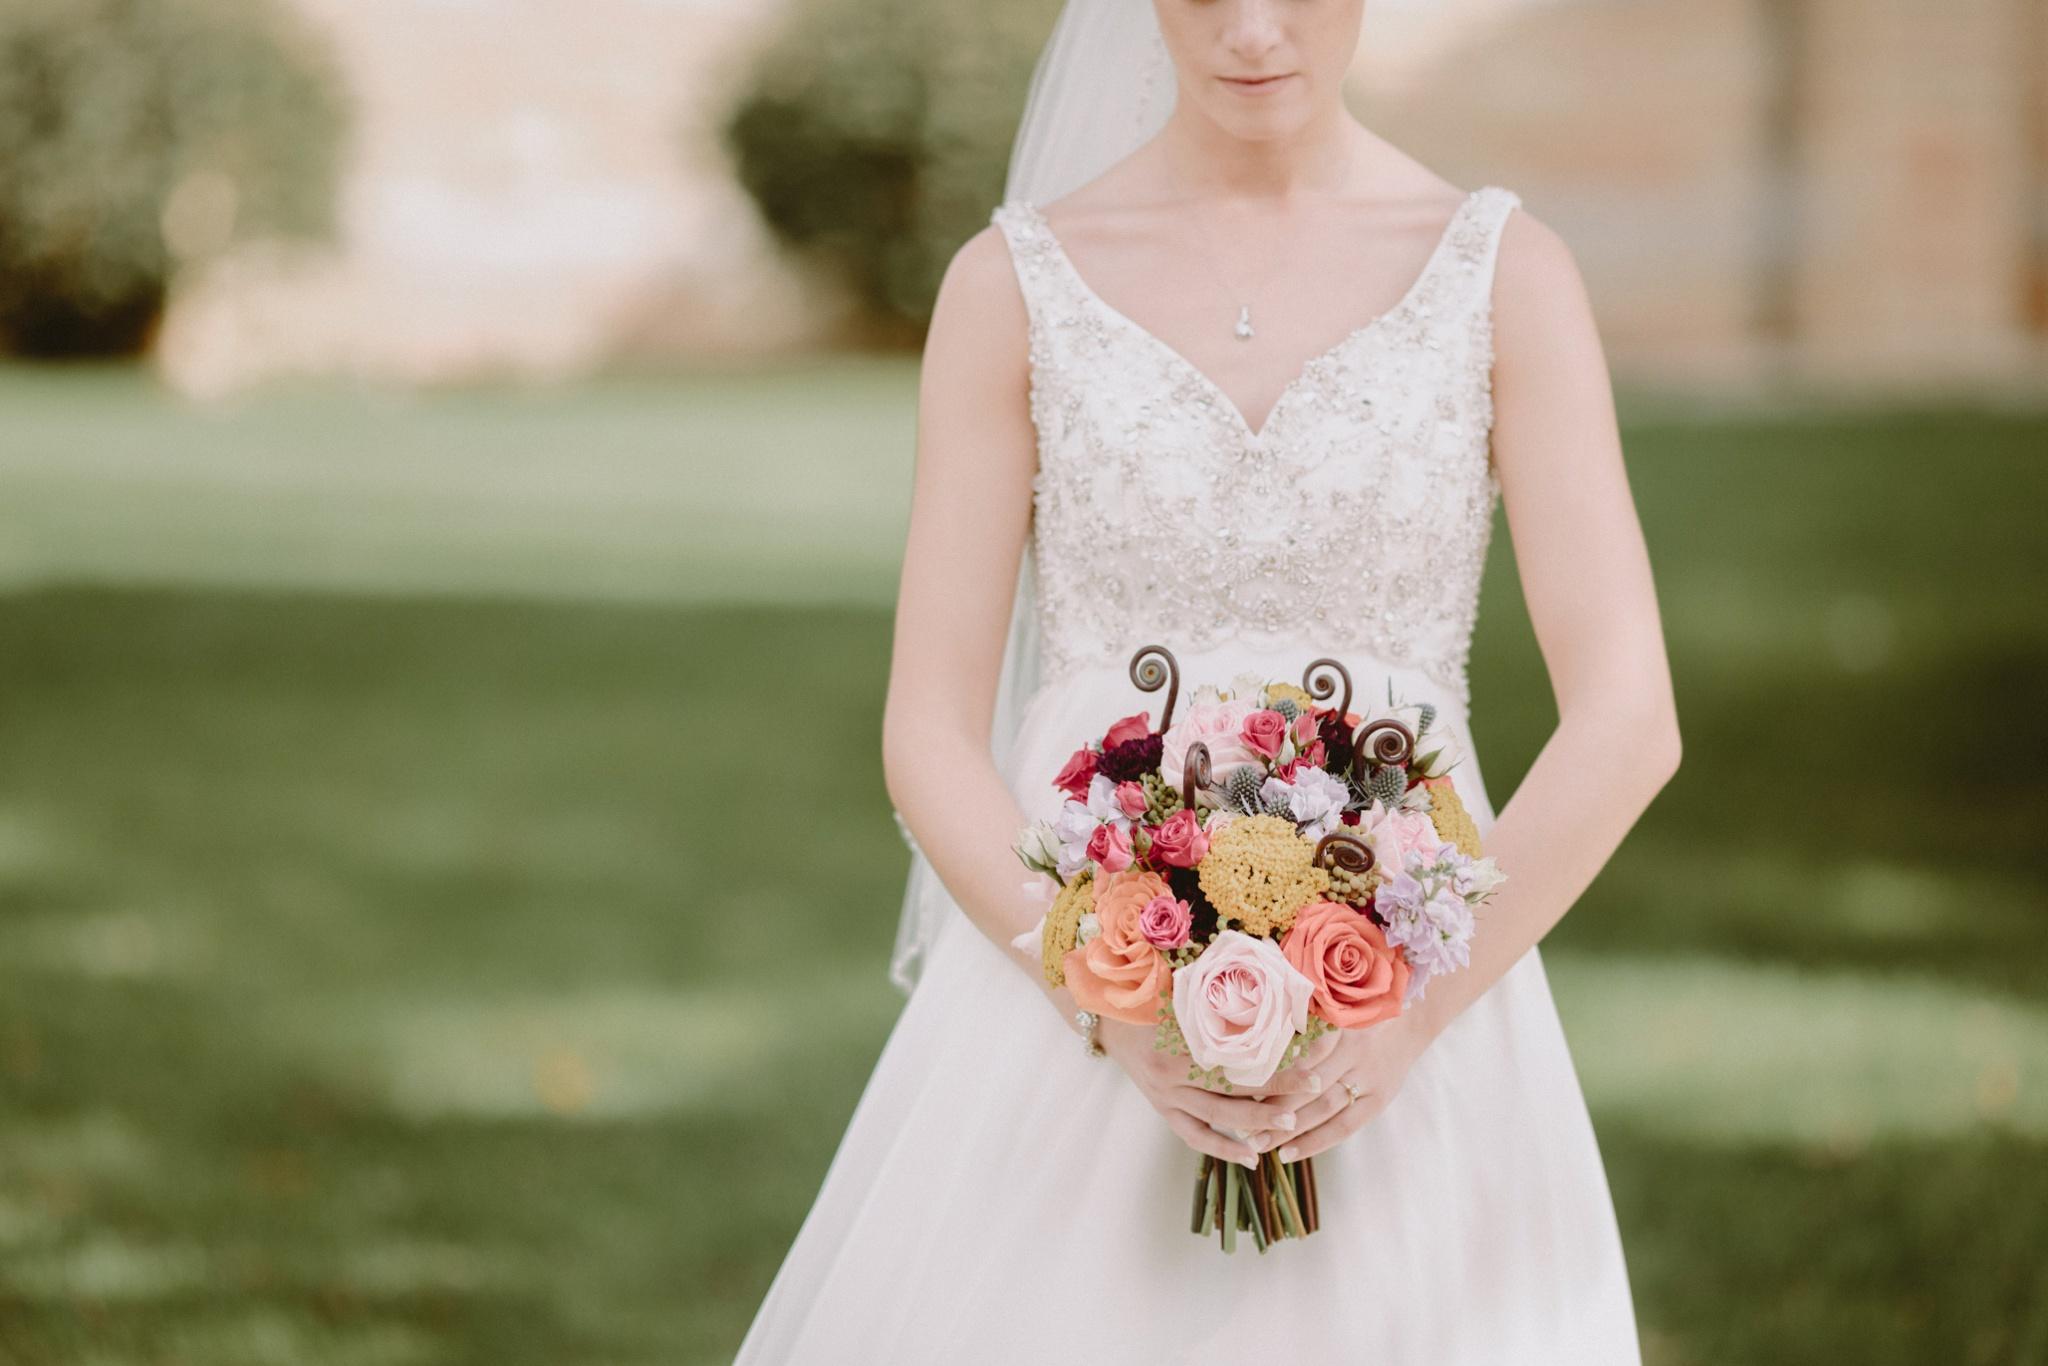 iowa-venue-fort-dodge-church-ceremony-sleeveless-dress-pink-coral-bouquet